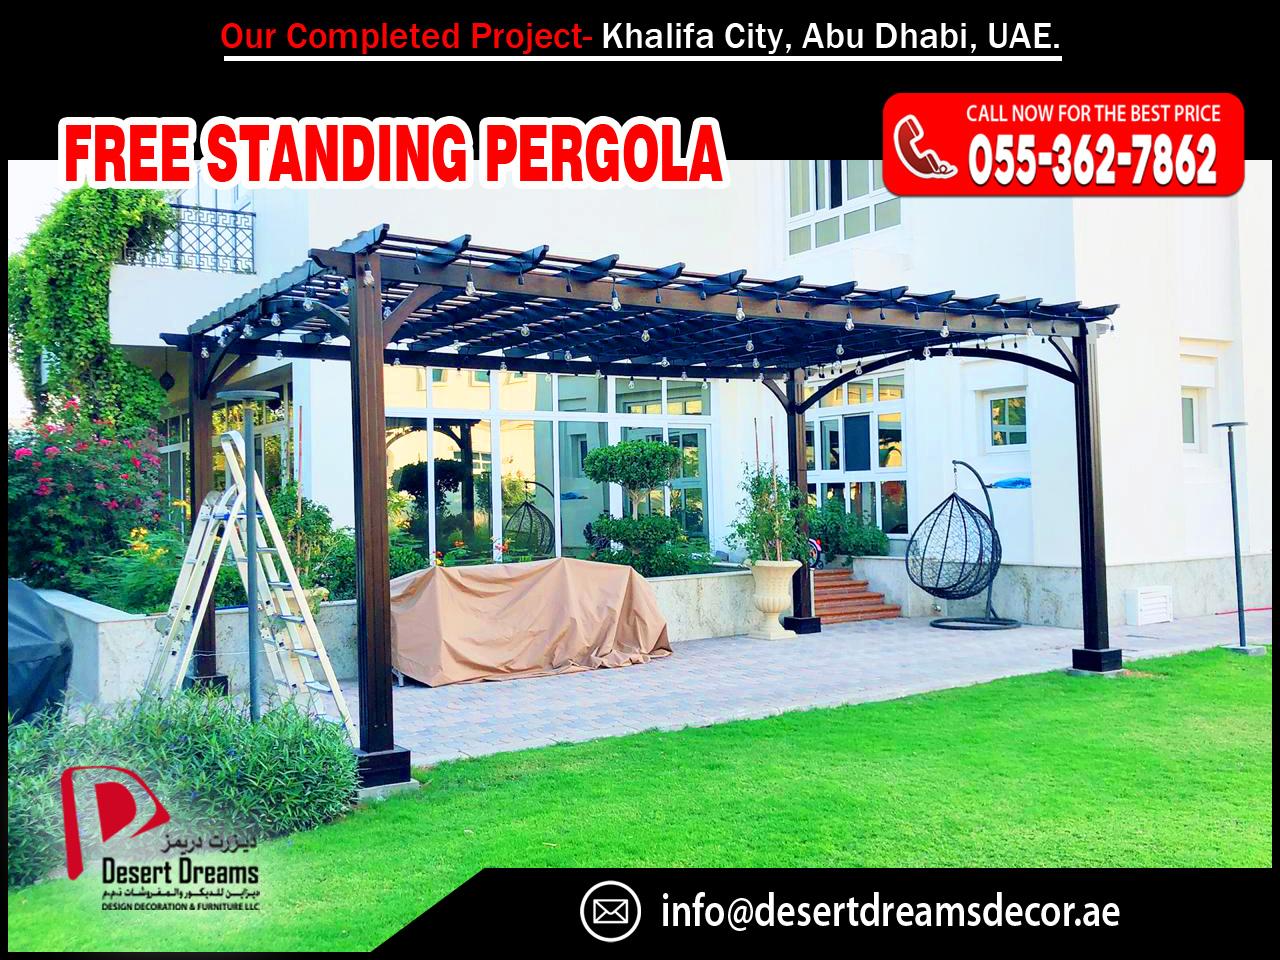 Free Standing Pergola in UAE-2.jpg